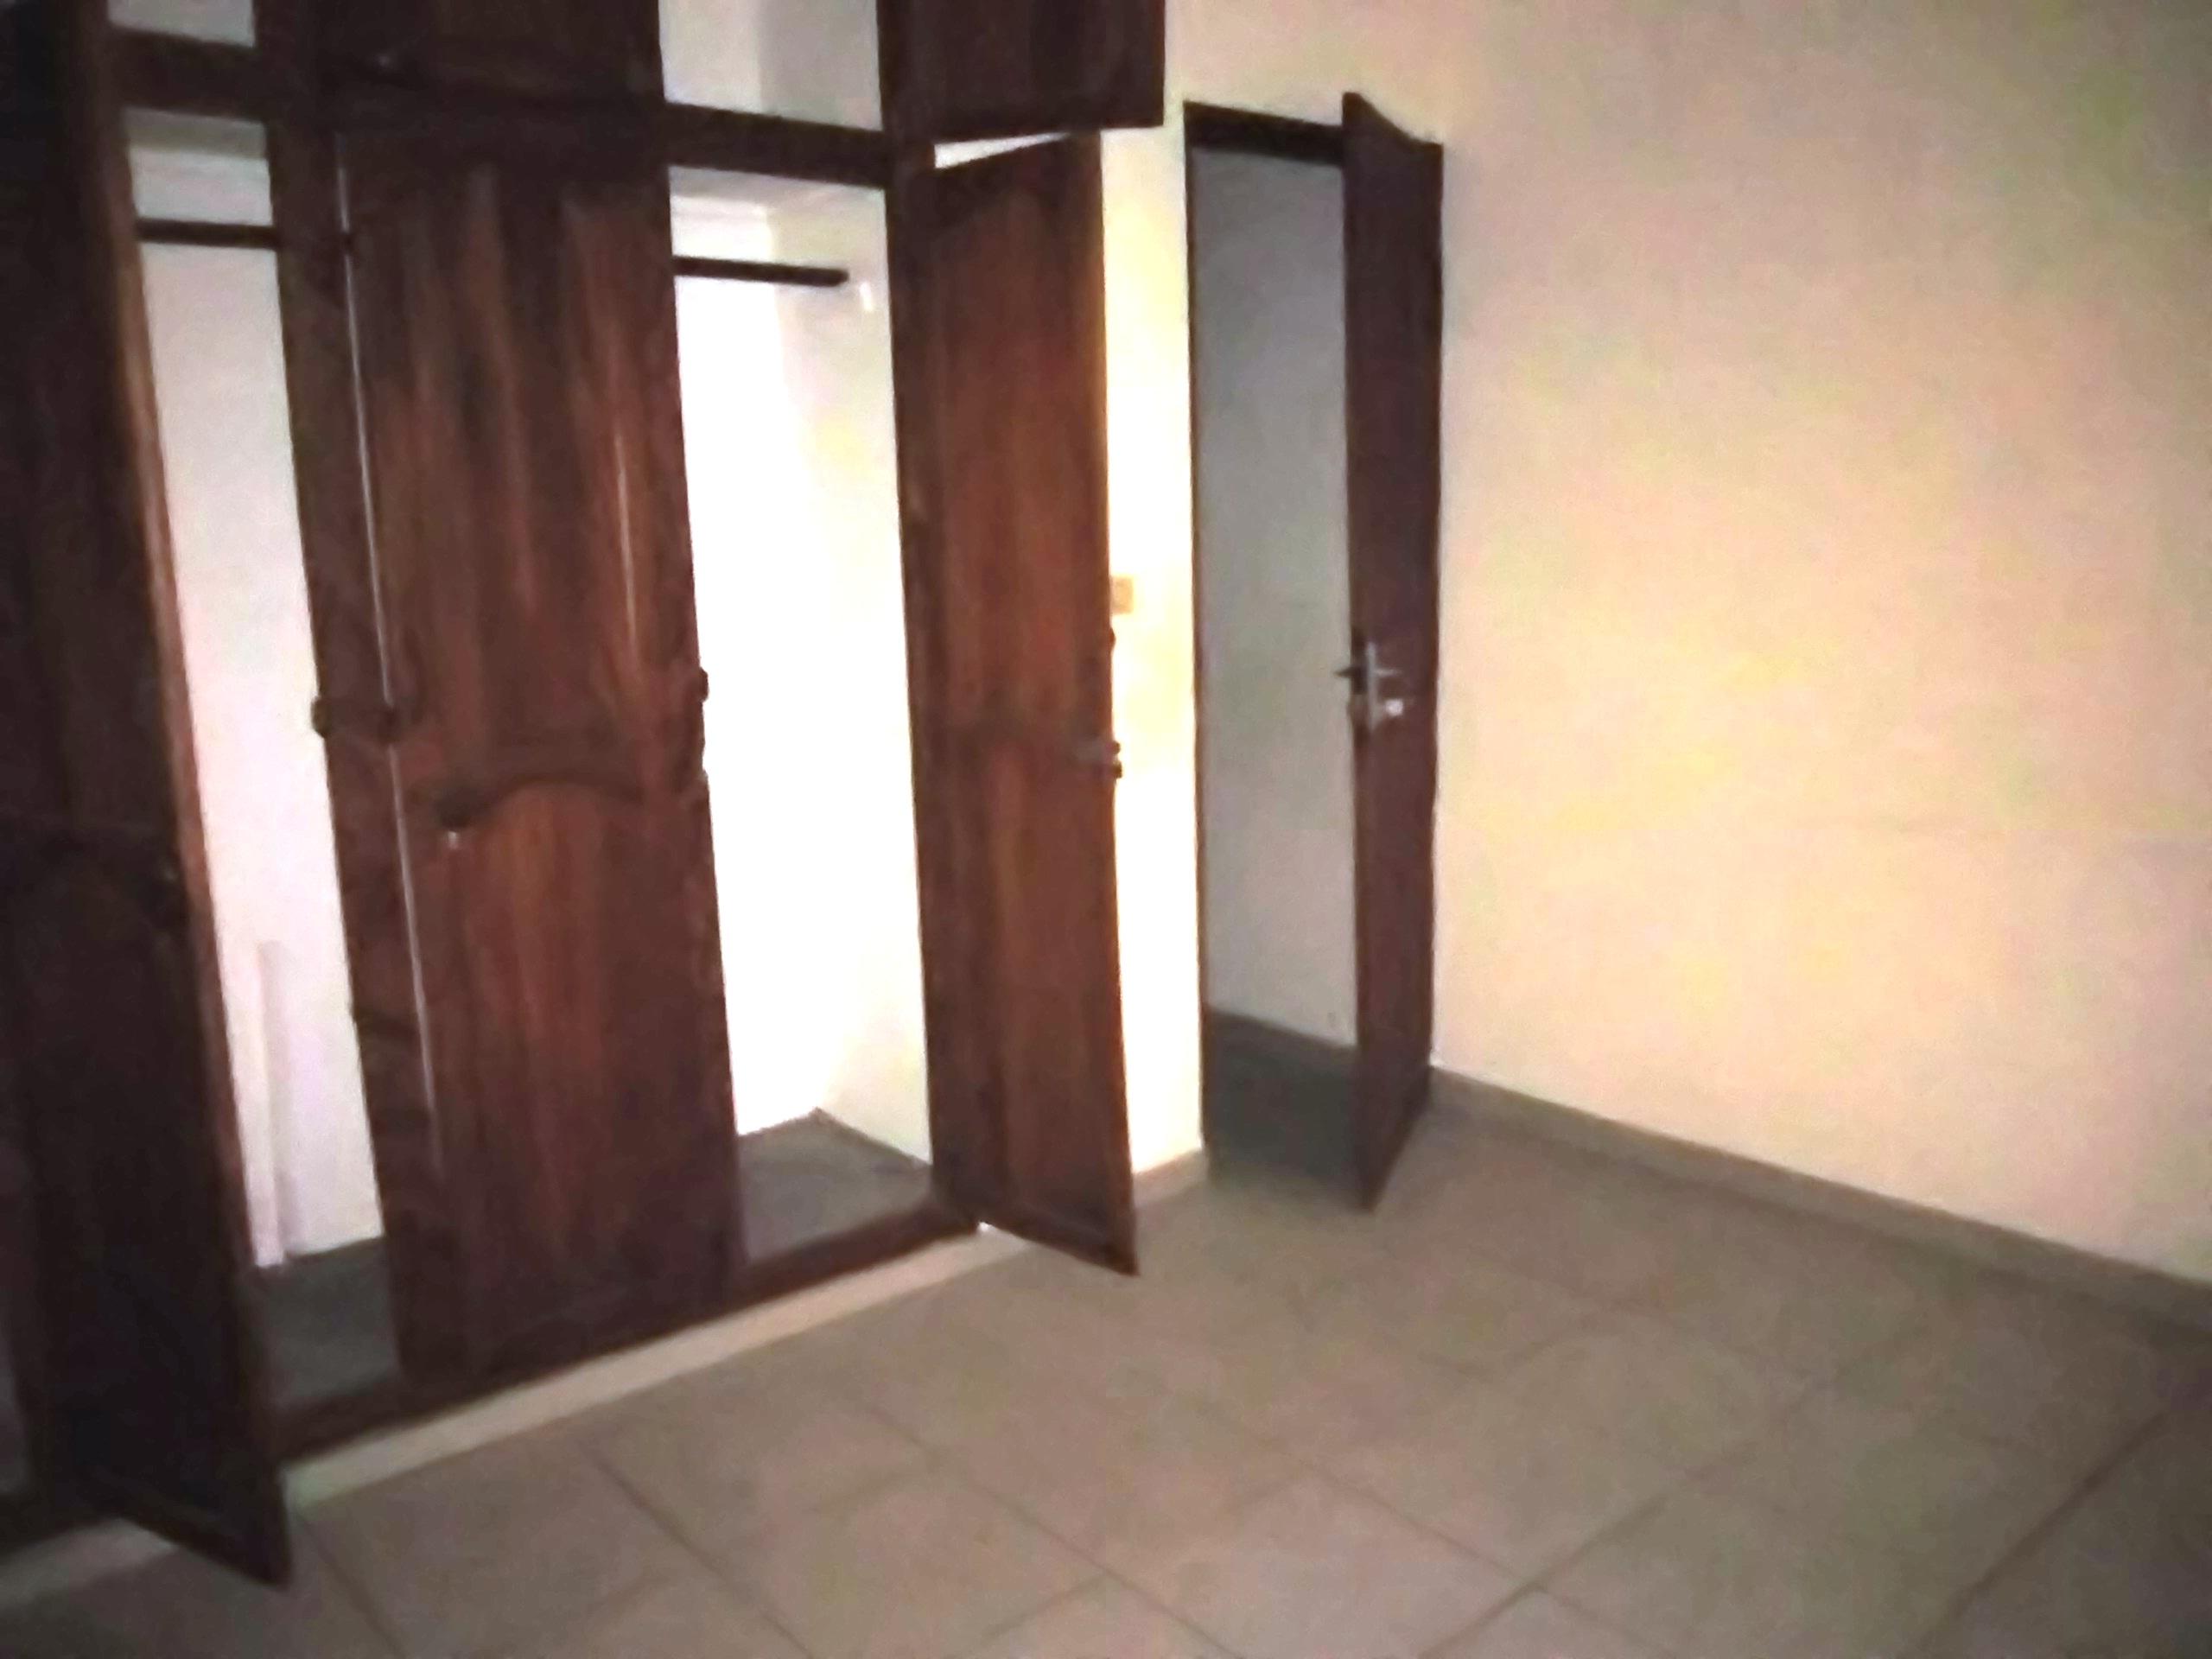 Studio to rent - Douala, Makepe, petit pays - 35 000 FCFA / month